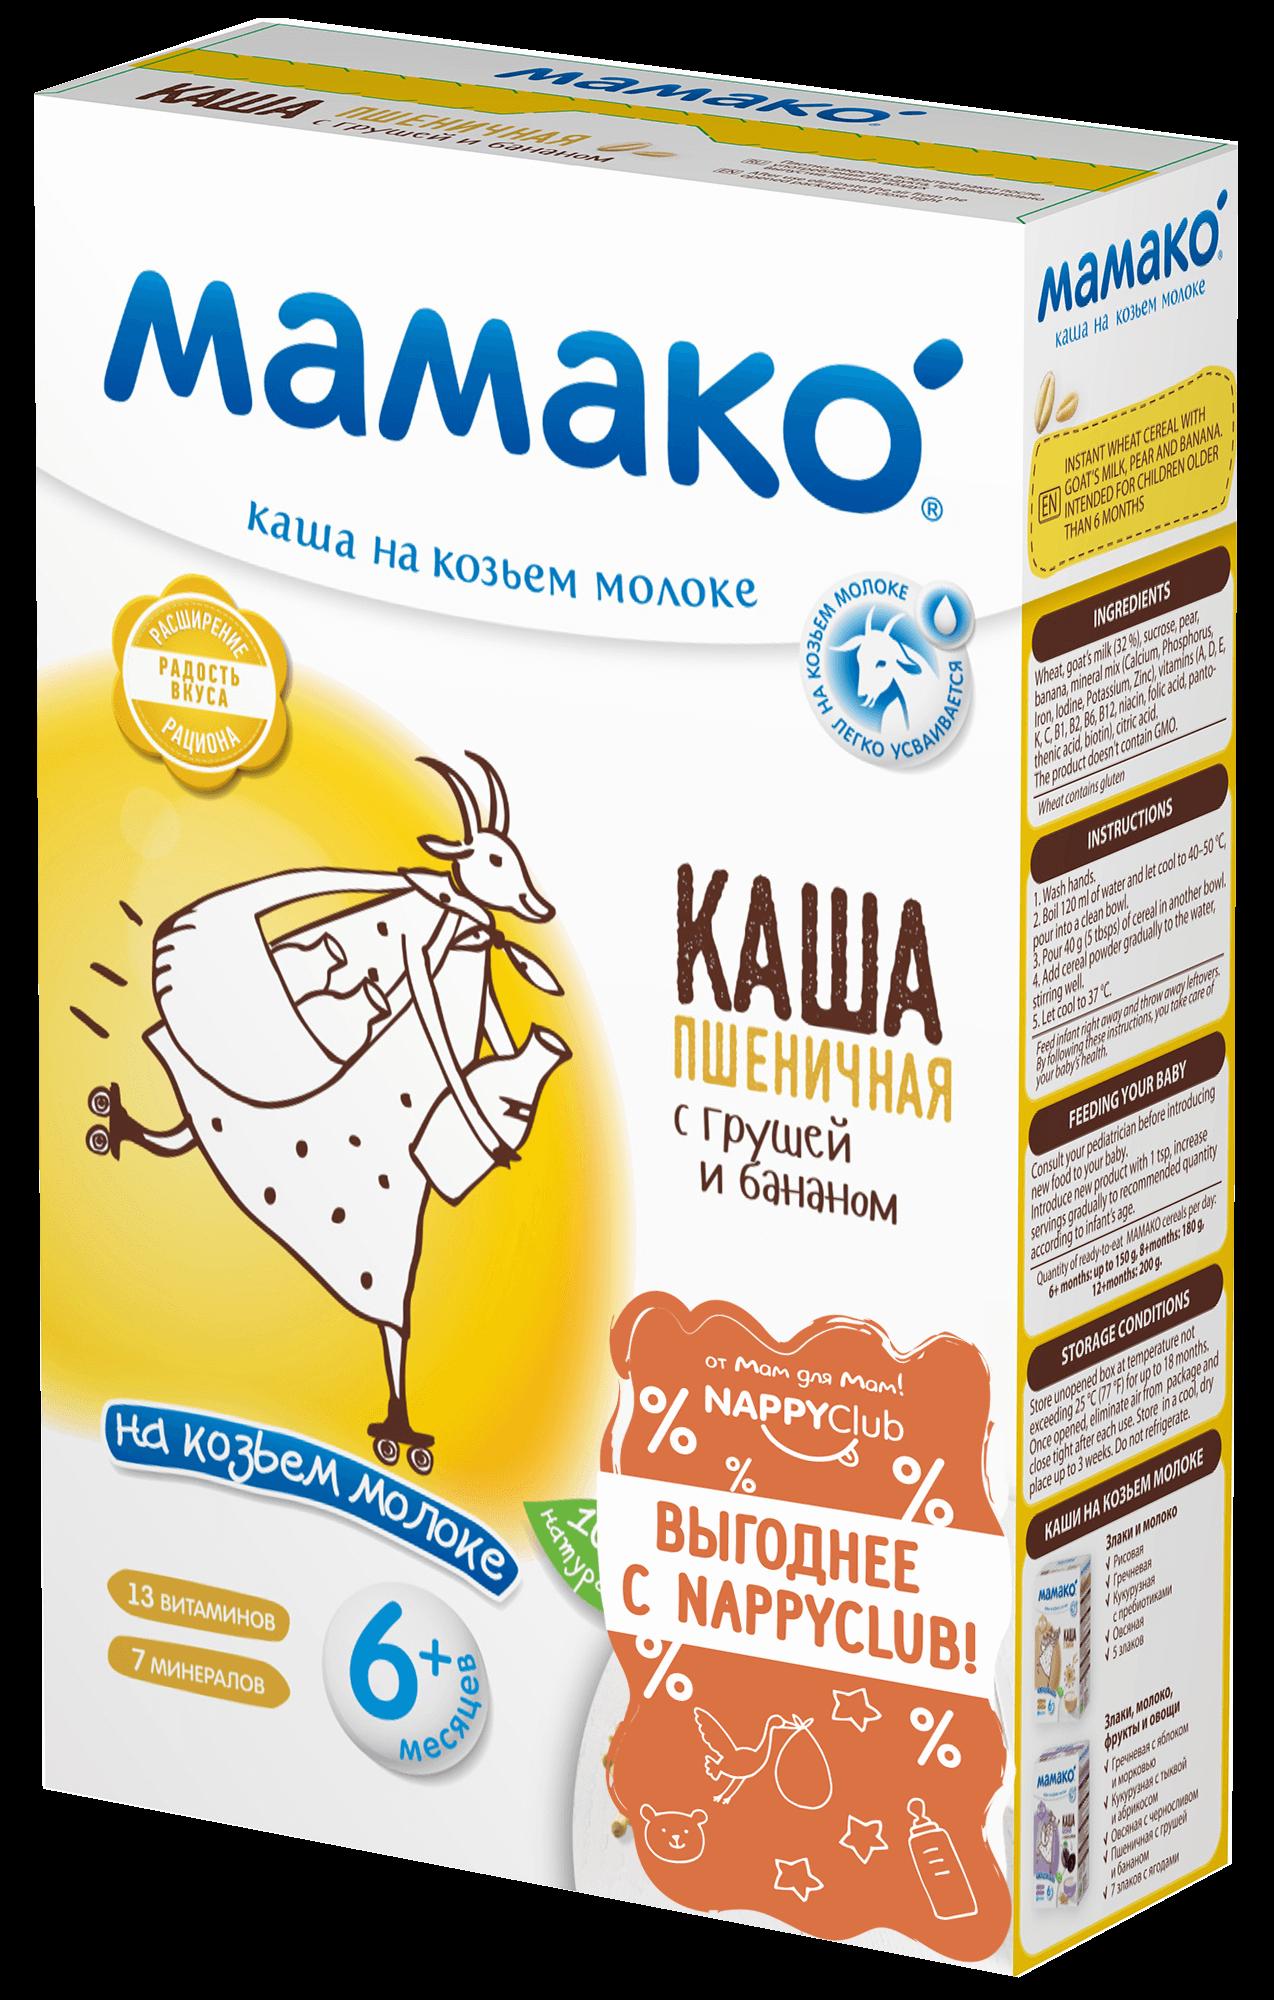 Каша пшеничная <br>с грушей и бананом на козьем молоке МАМАКО фото